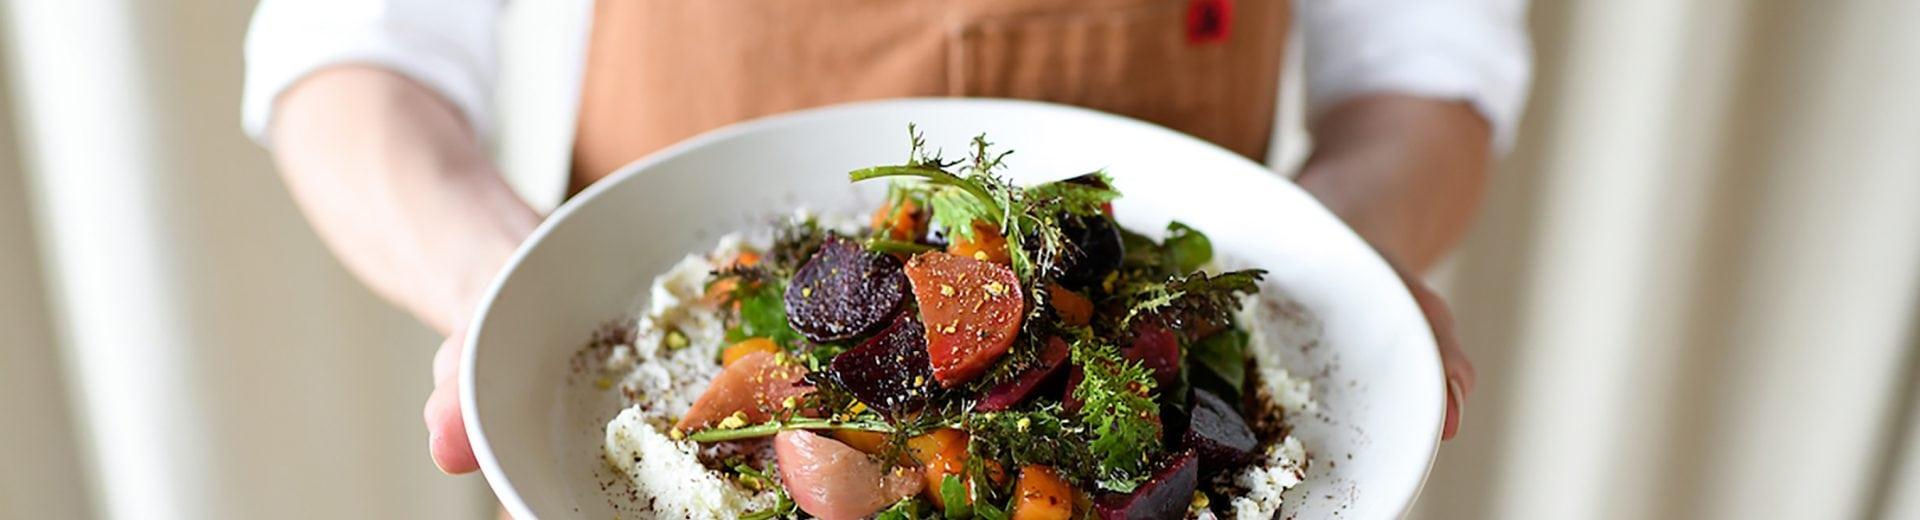 blackberry mountain food and wine hotel beet salad